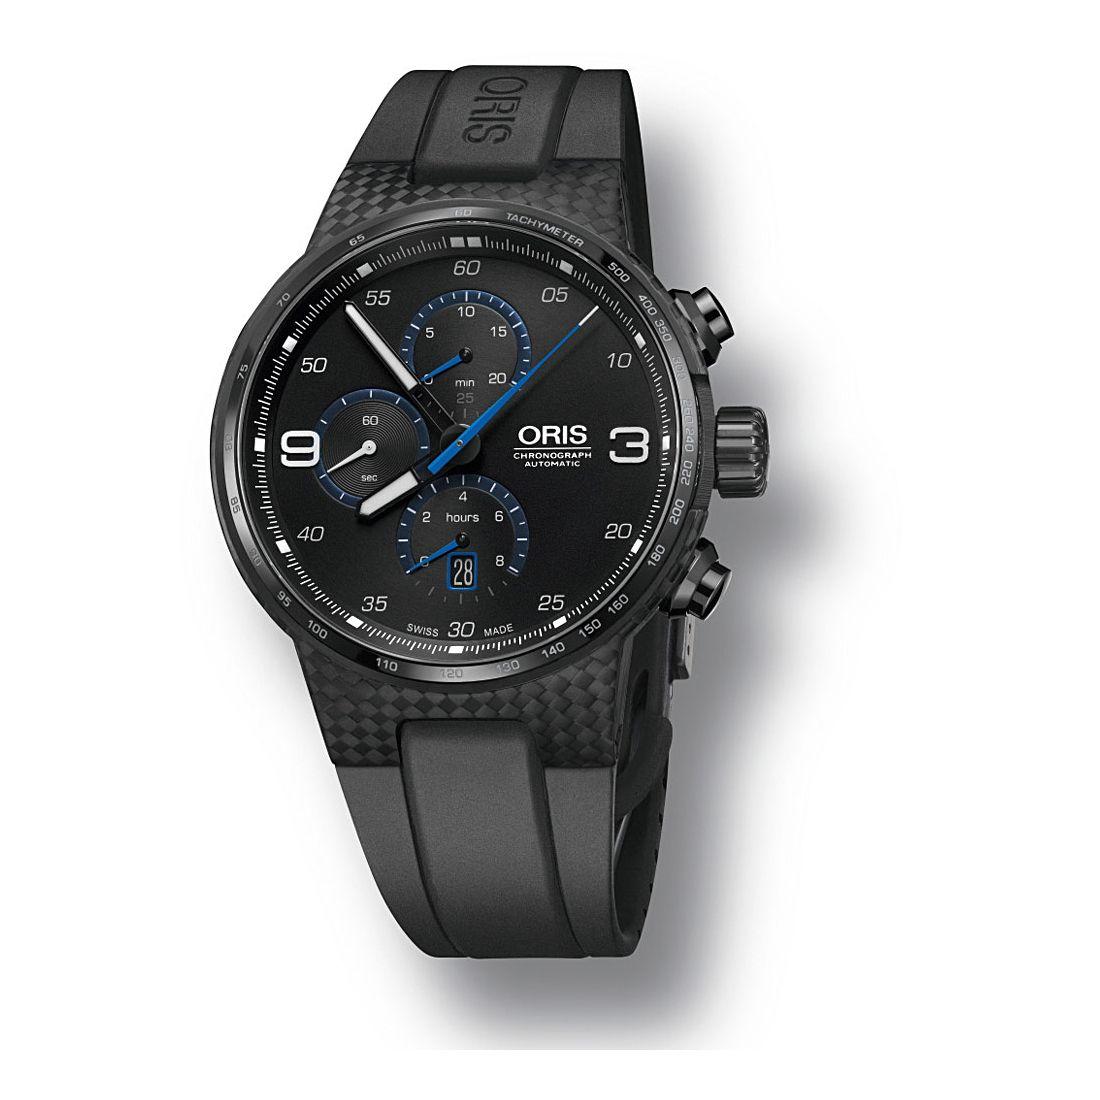 Oris Williams Chronograph Carbon Fibre Extreme - 01 674 7725 8764-07 424 50FCTB  - 1